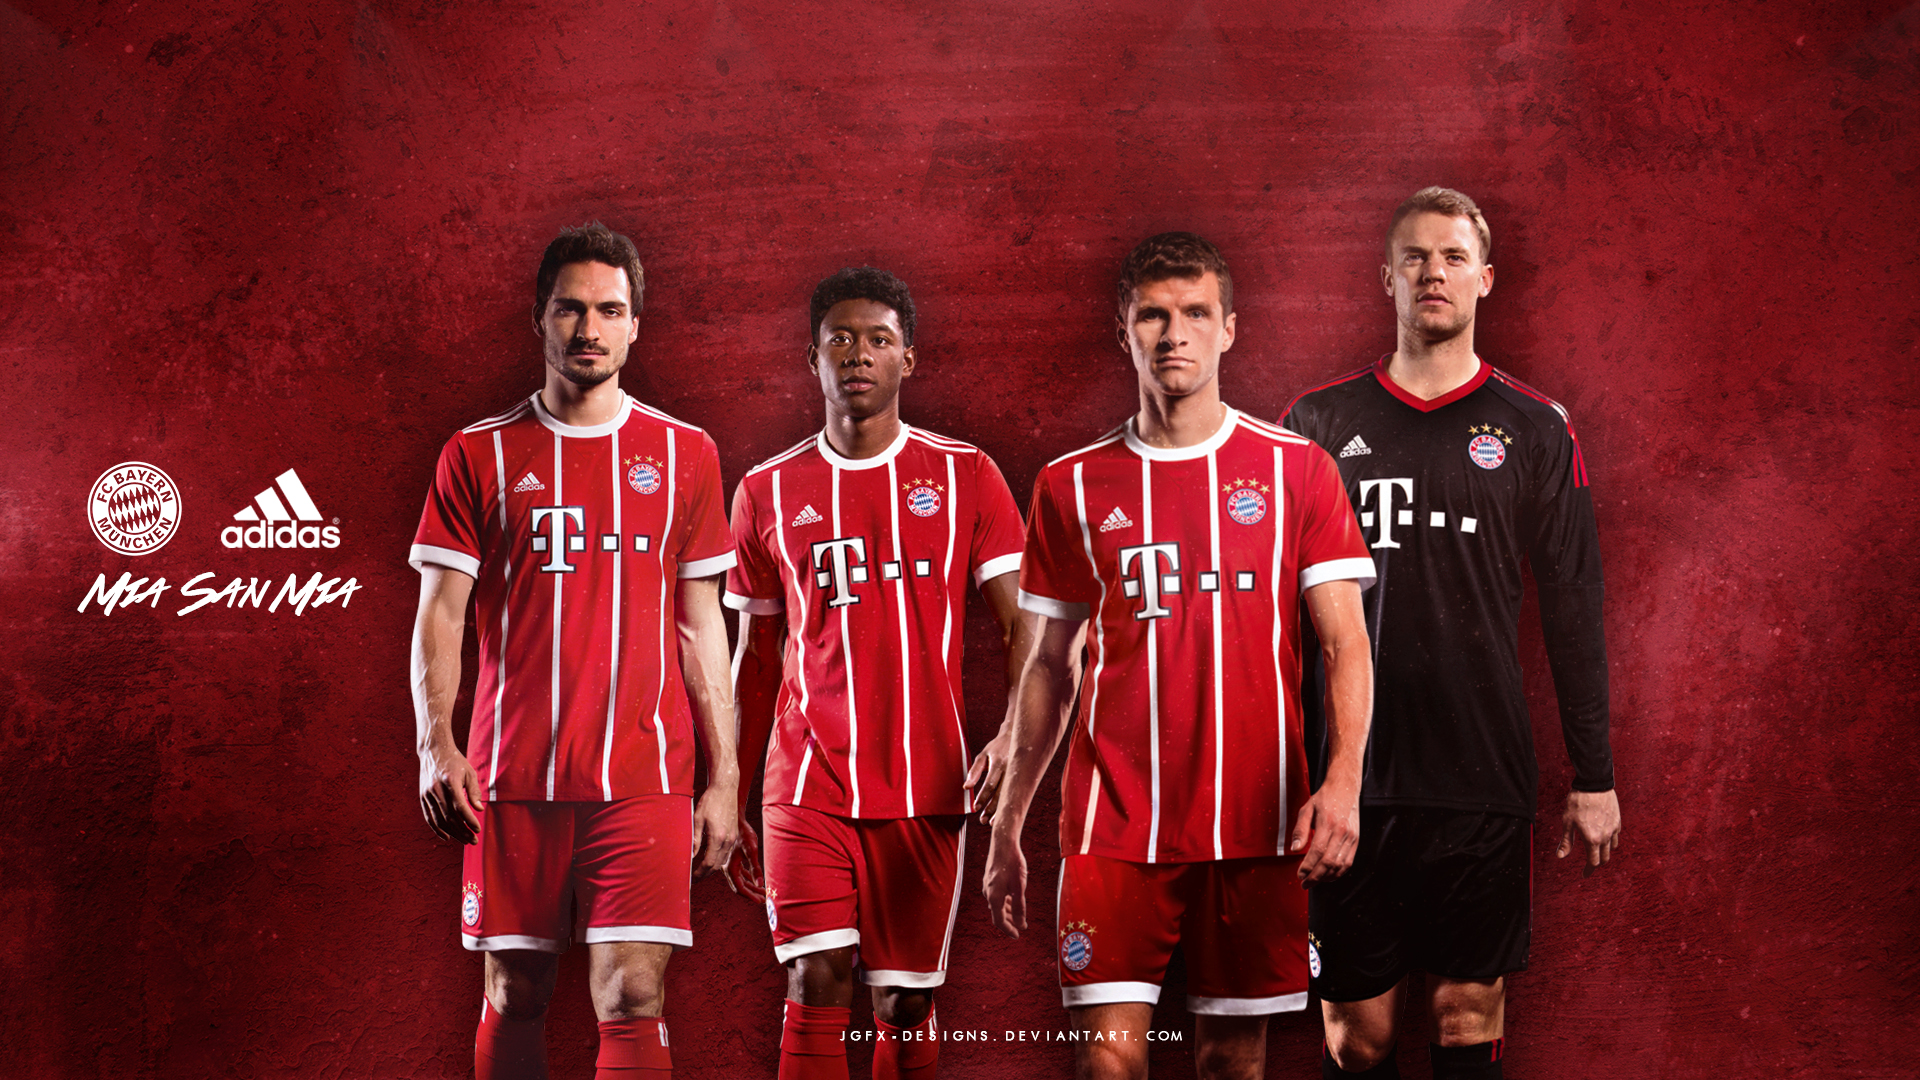 Bayern Munchen 2017-2018 adidas ad by jgfx-designs on ...